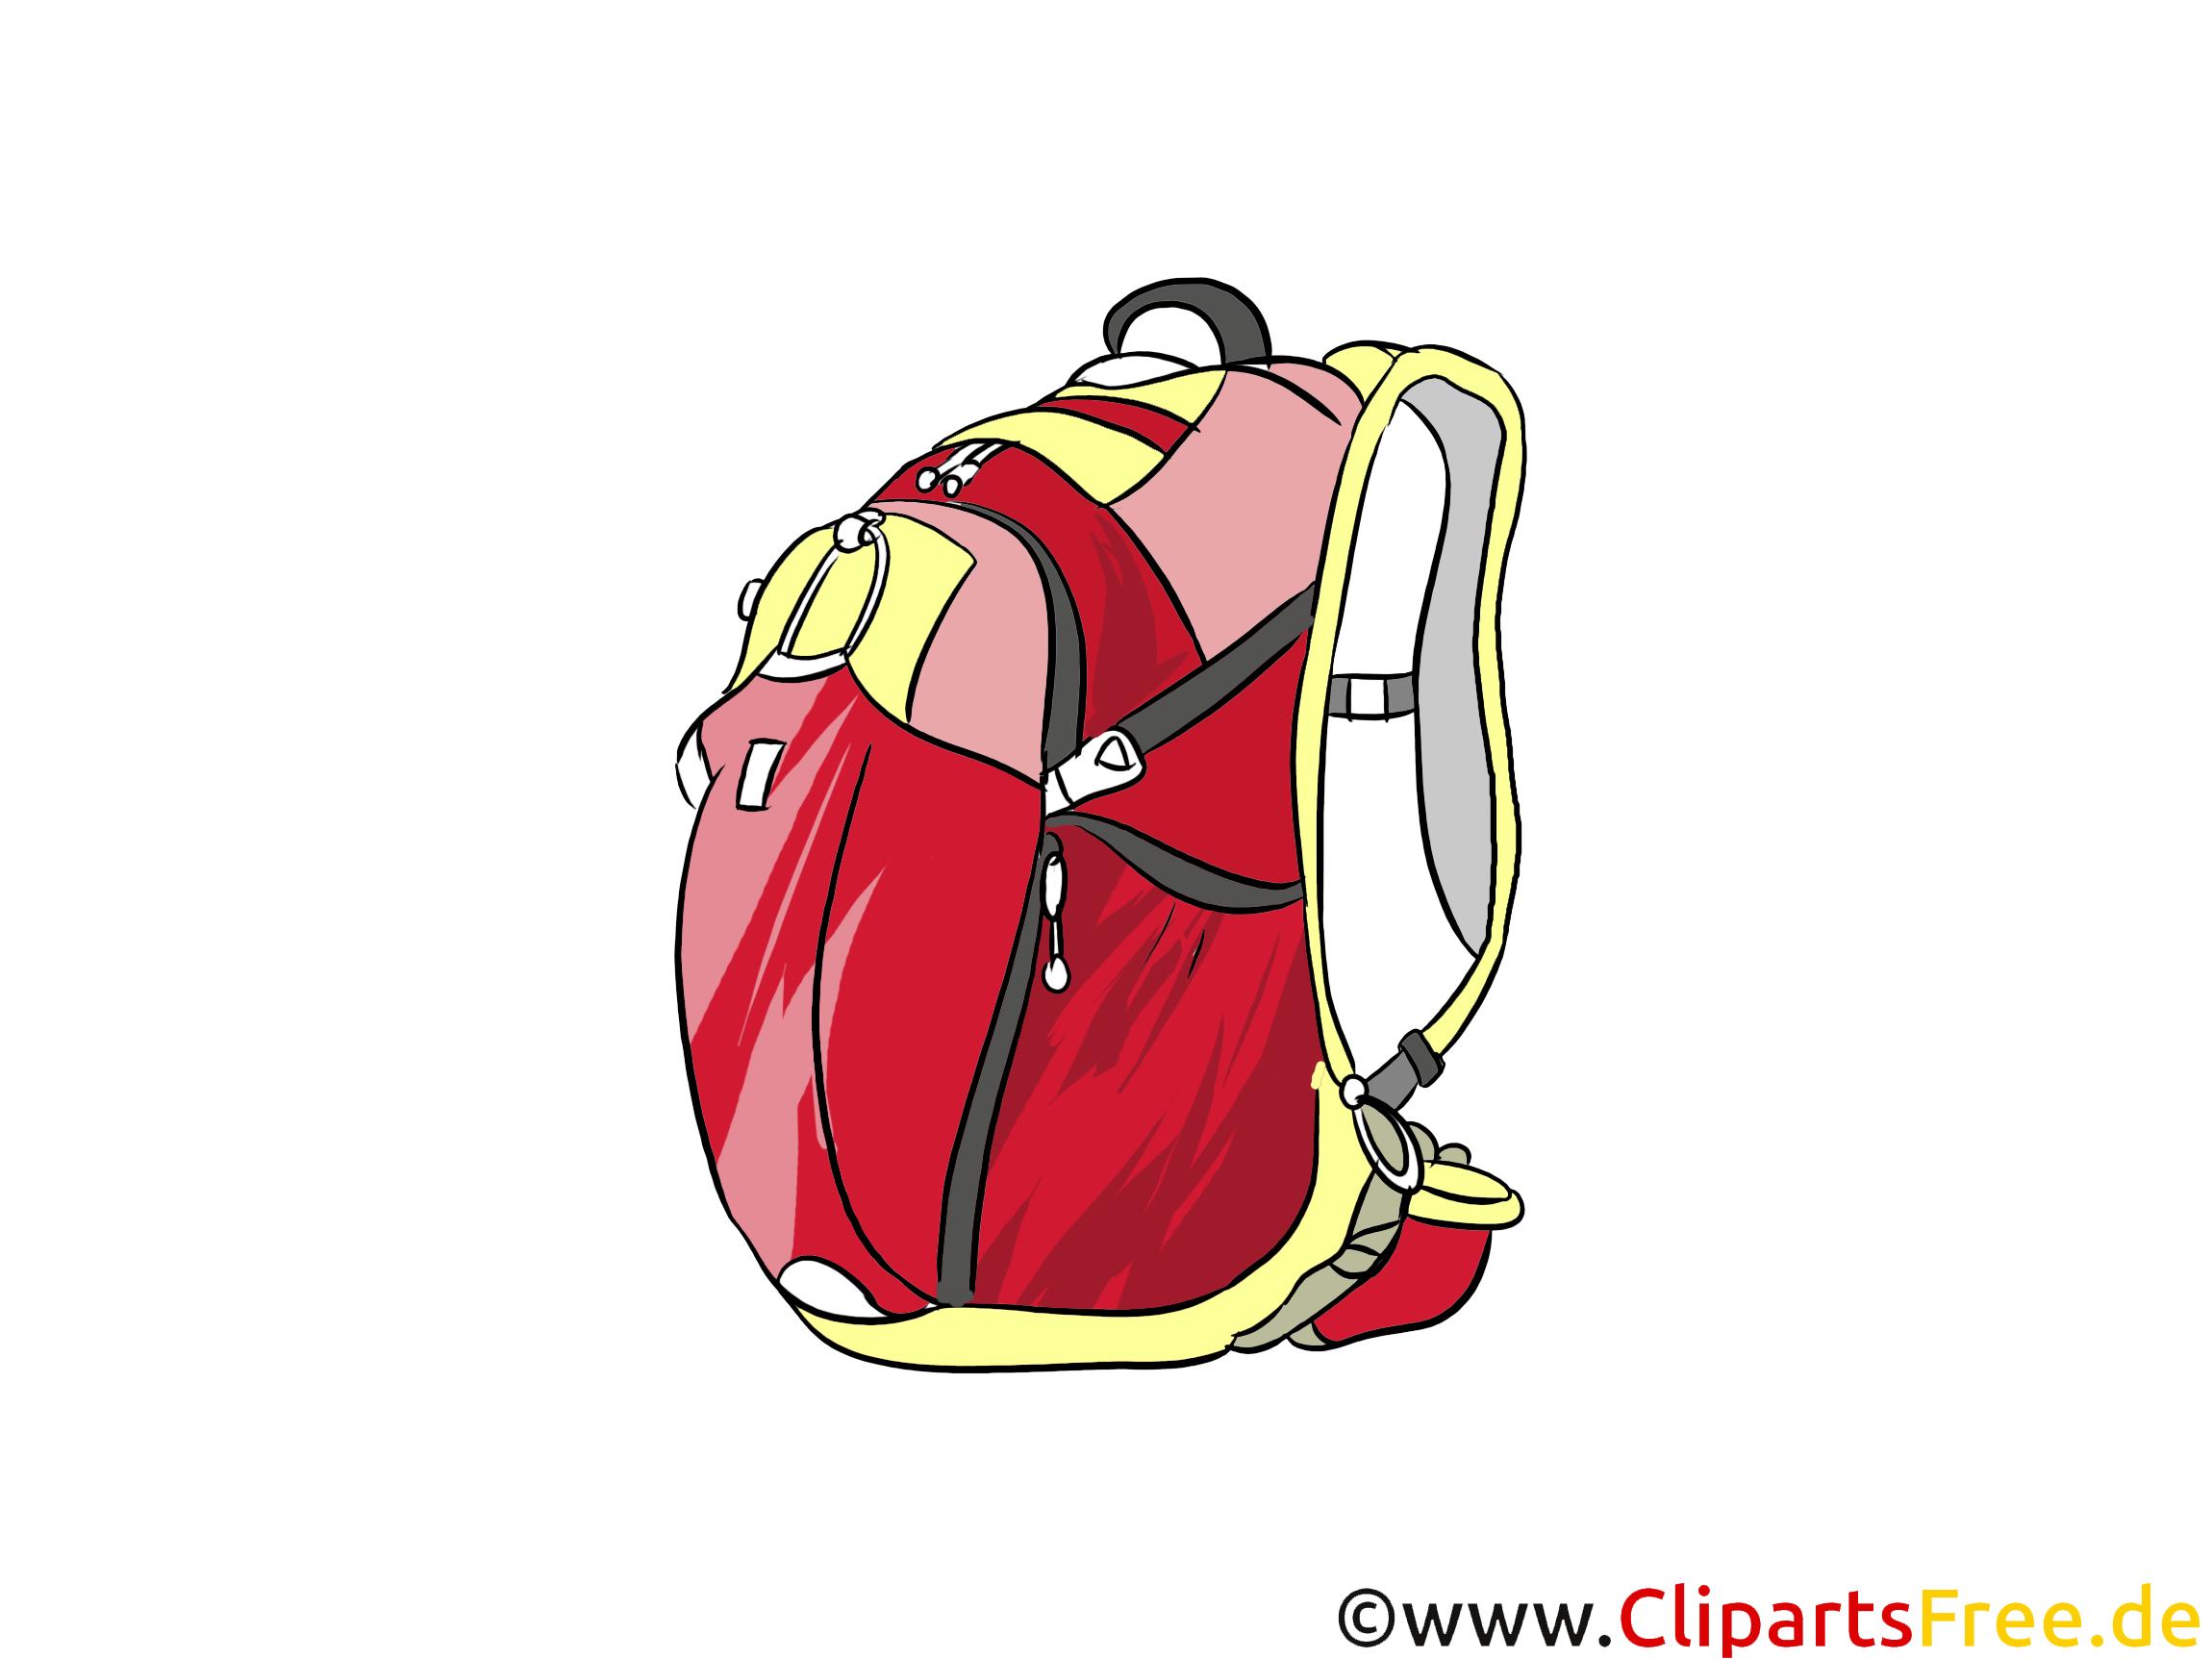 Sport-Rucksack Bild, Illustration, Clipart